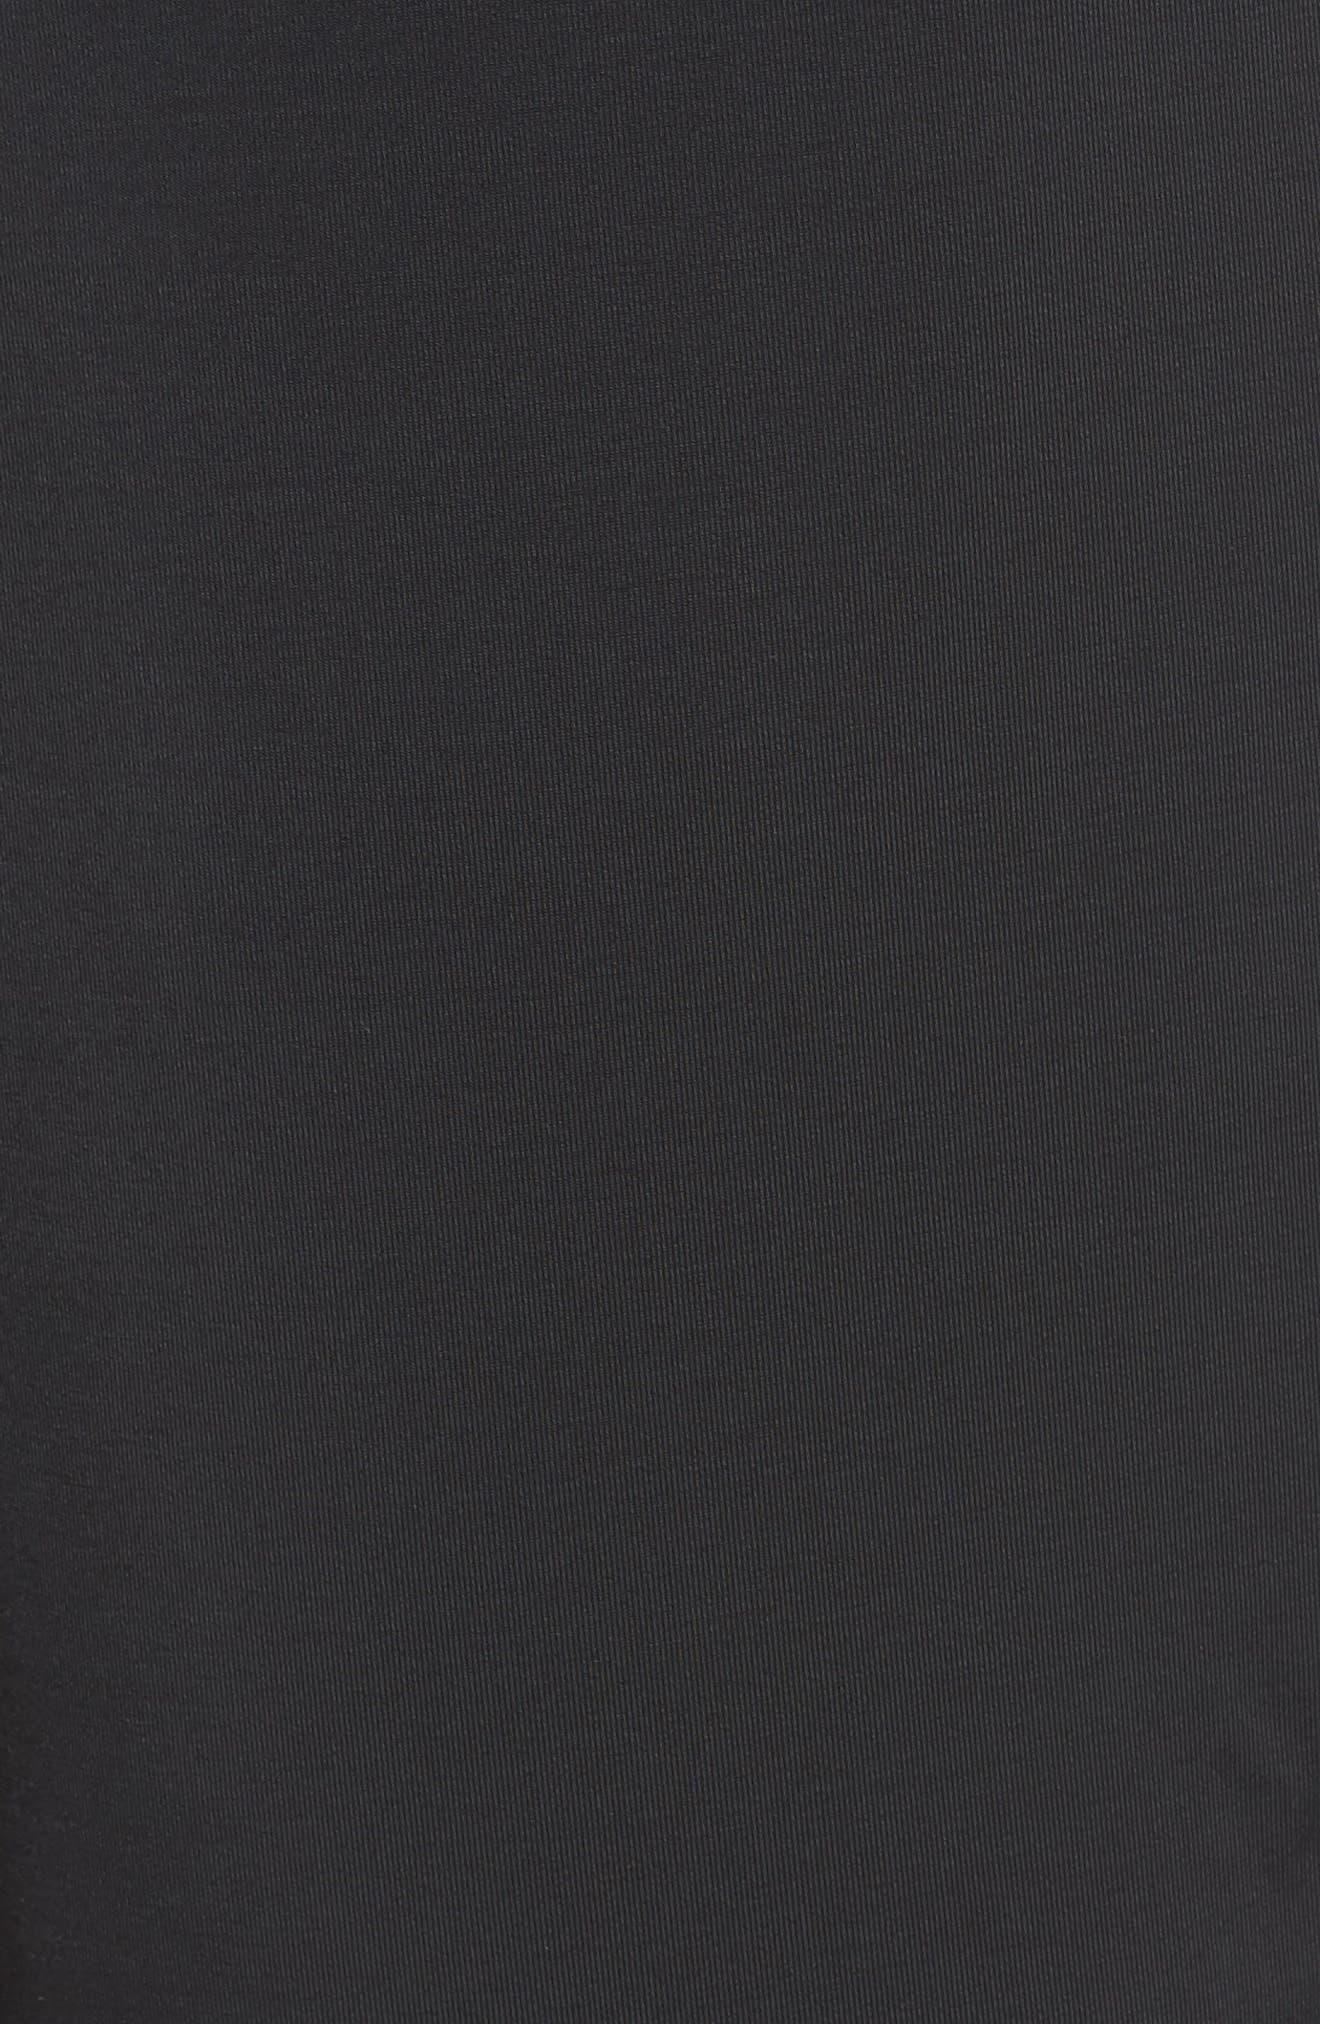 Dry Touch Training Pants,                             Alternate thumbnail 6, color,                             Black/ Black